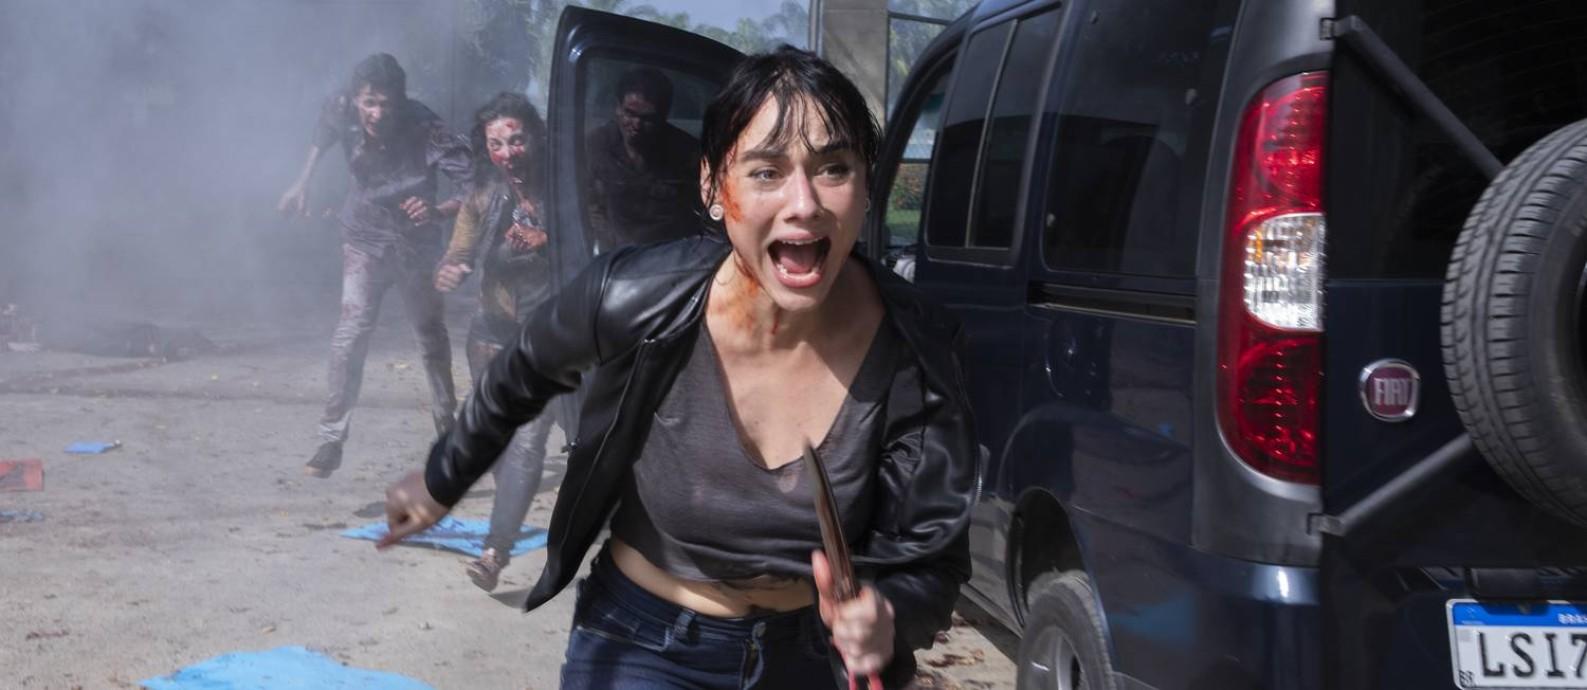 A protagonista Nina (Ana Hartmann) corre de ataque zumbi em 'Reality Z', nova série da Netflix Foto: SUZANNA TIERIE/NETFLIX